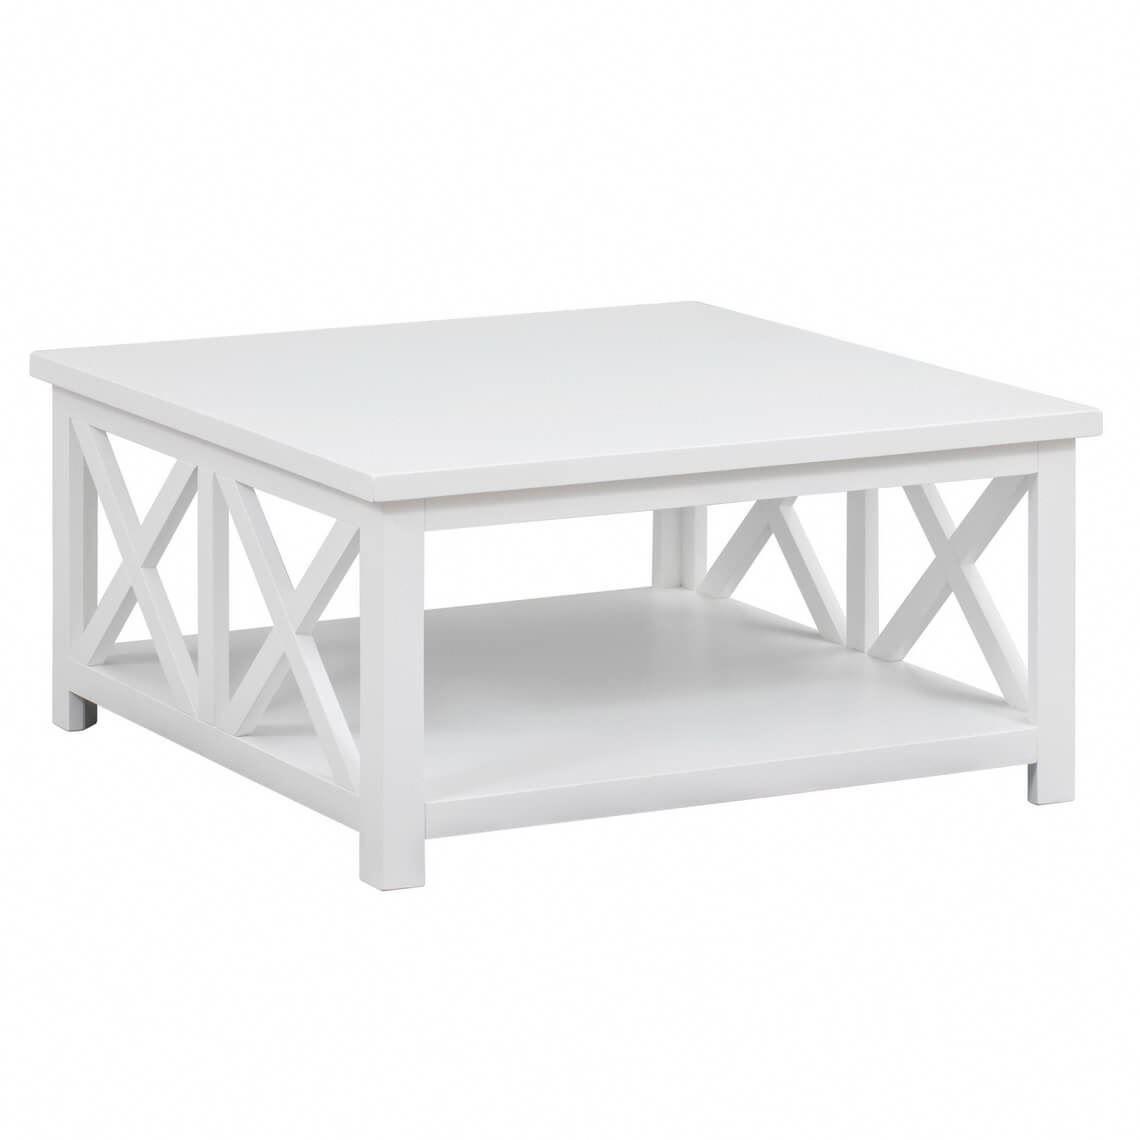 Furniture Discount Atlanta Cheapfurniturelosangeles Code 9782149954 Coffee Table Coffee Table White Decorating Coffee Tables [ 1140 x 1140 Pixel ]